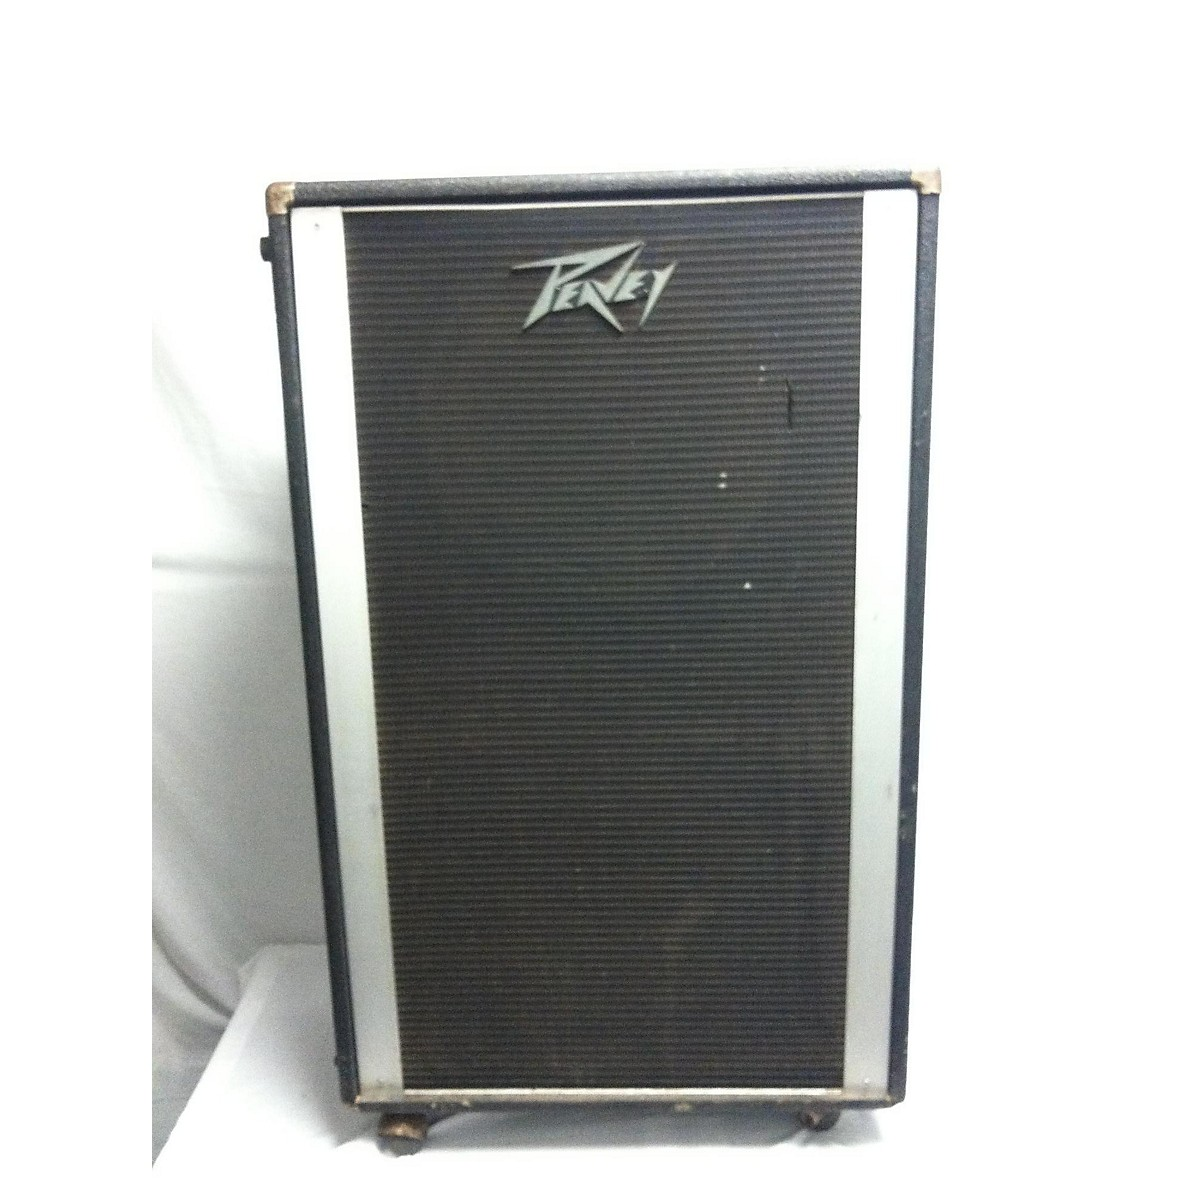 Peavey 215 Enclosure Bass Cabinet